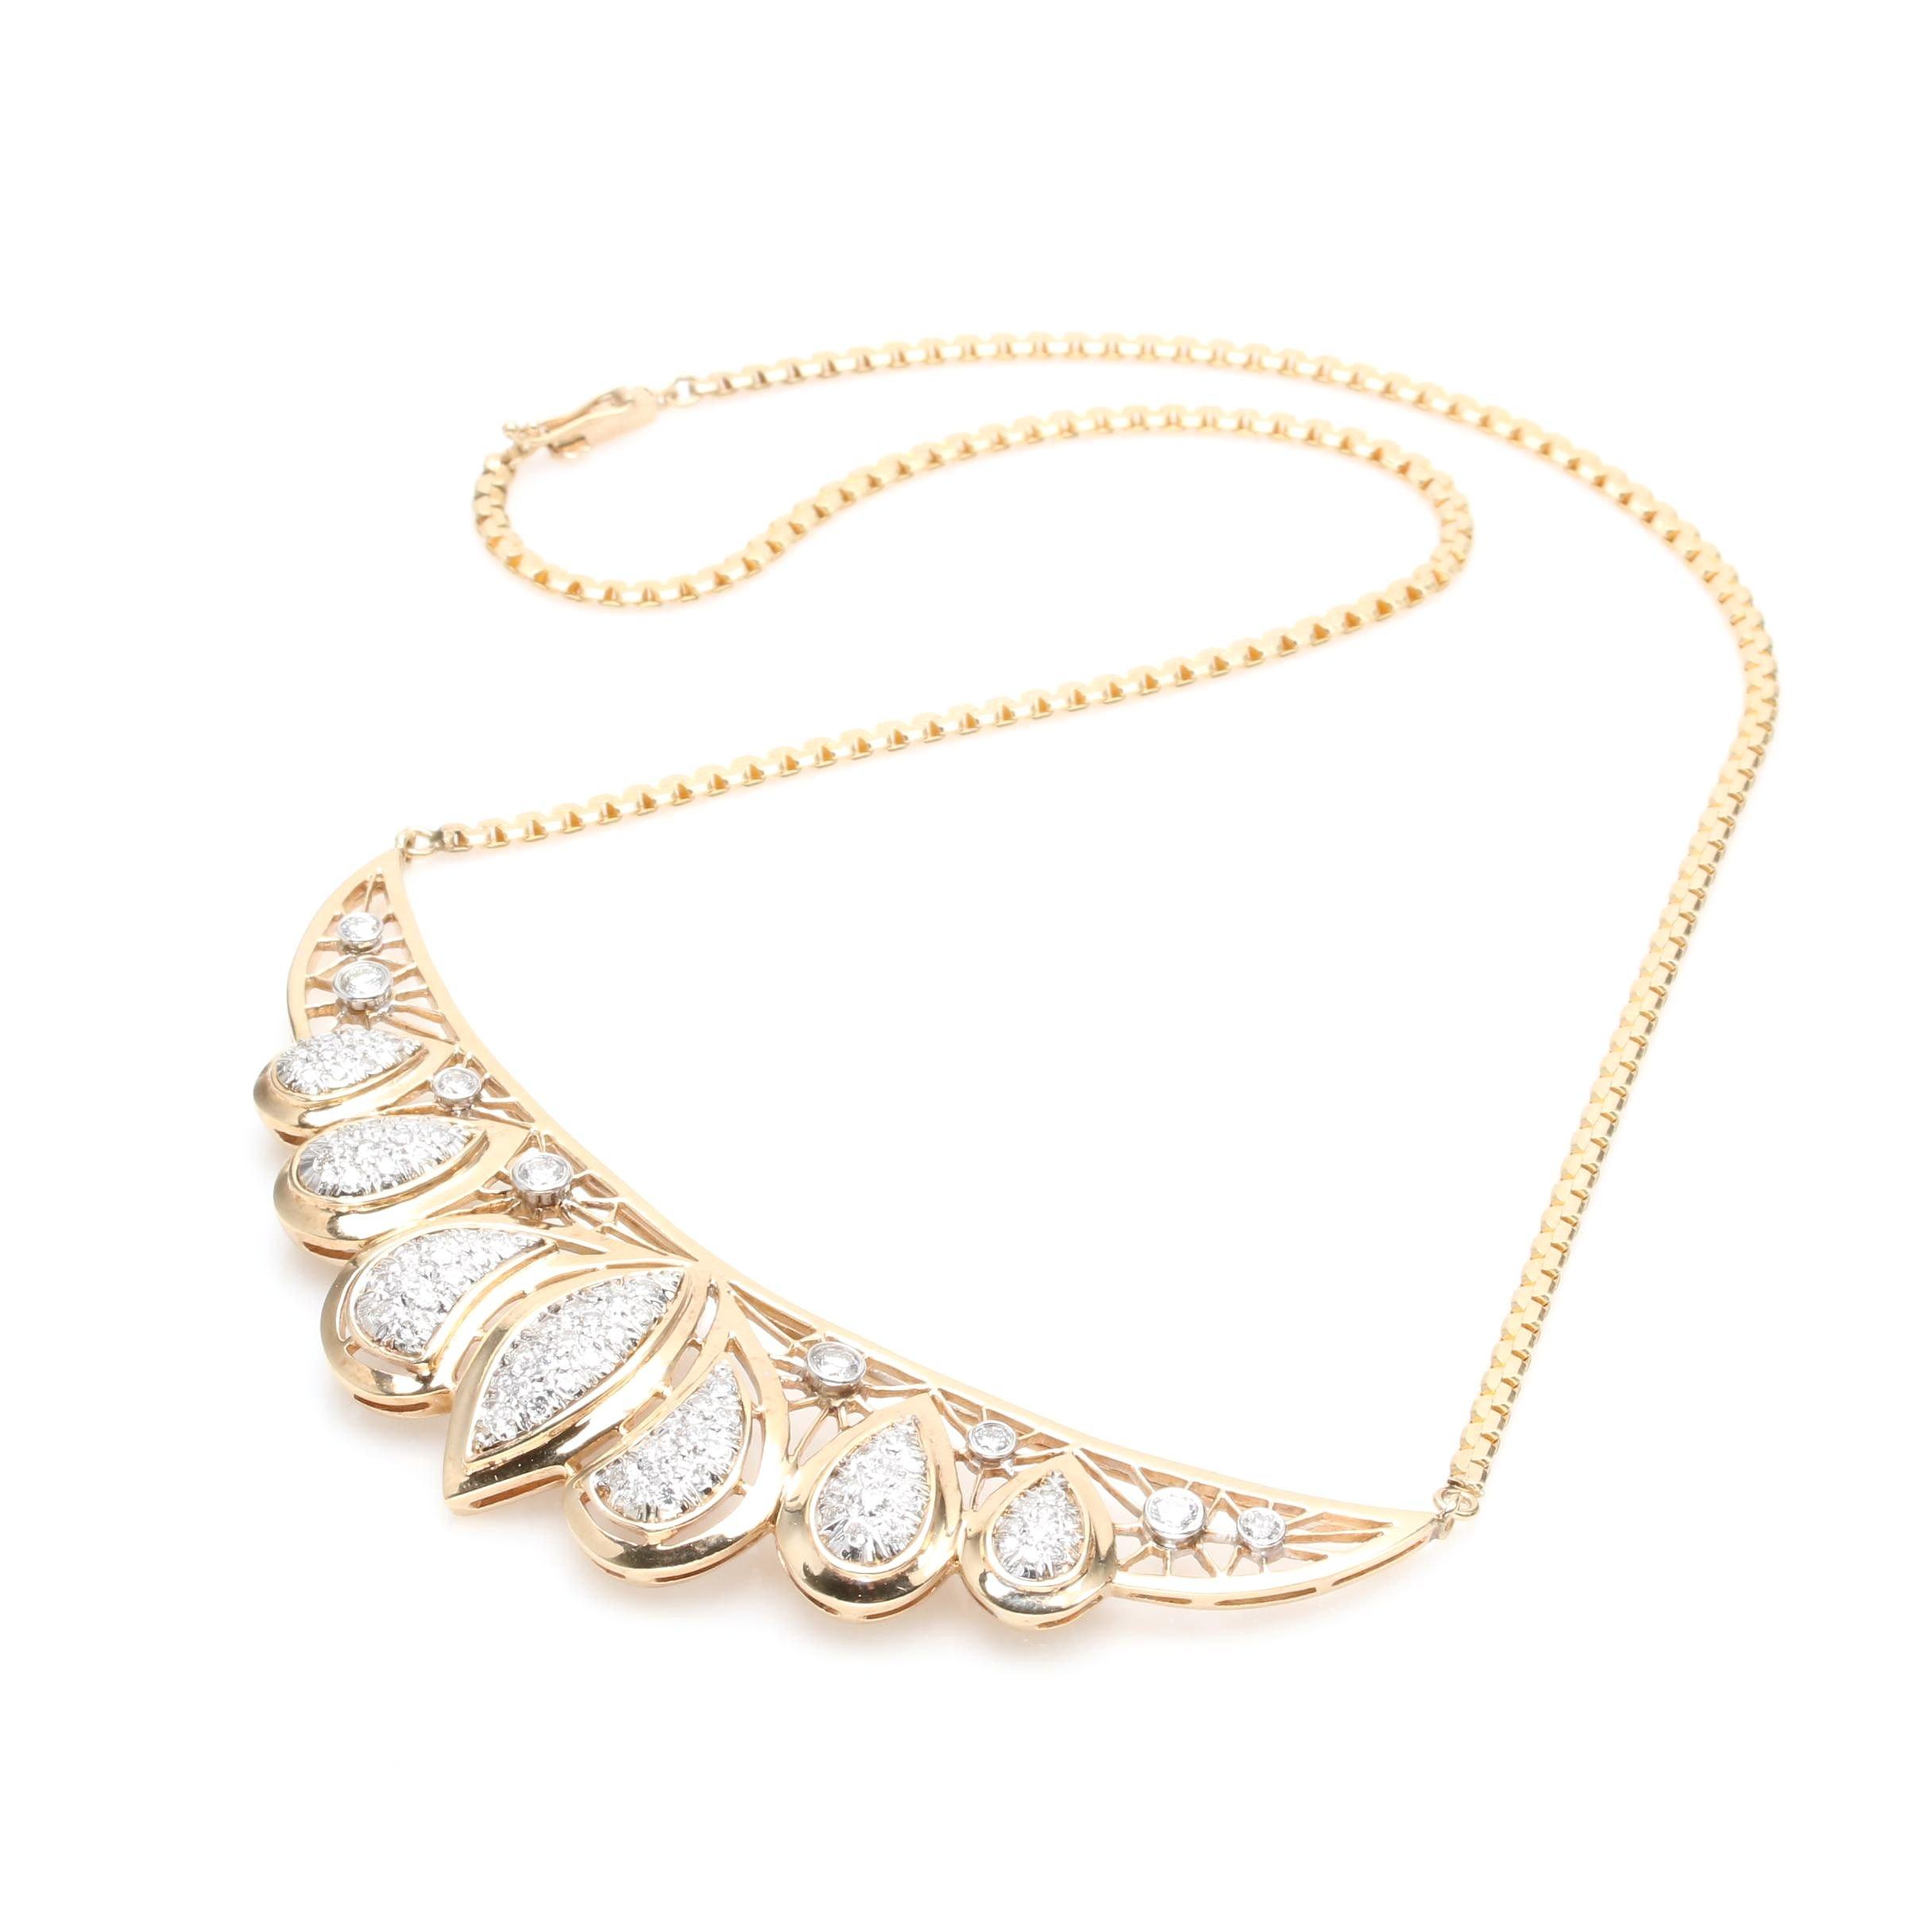 14K Yellow Gold 2.75 CTW Diamond Necklace